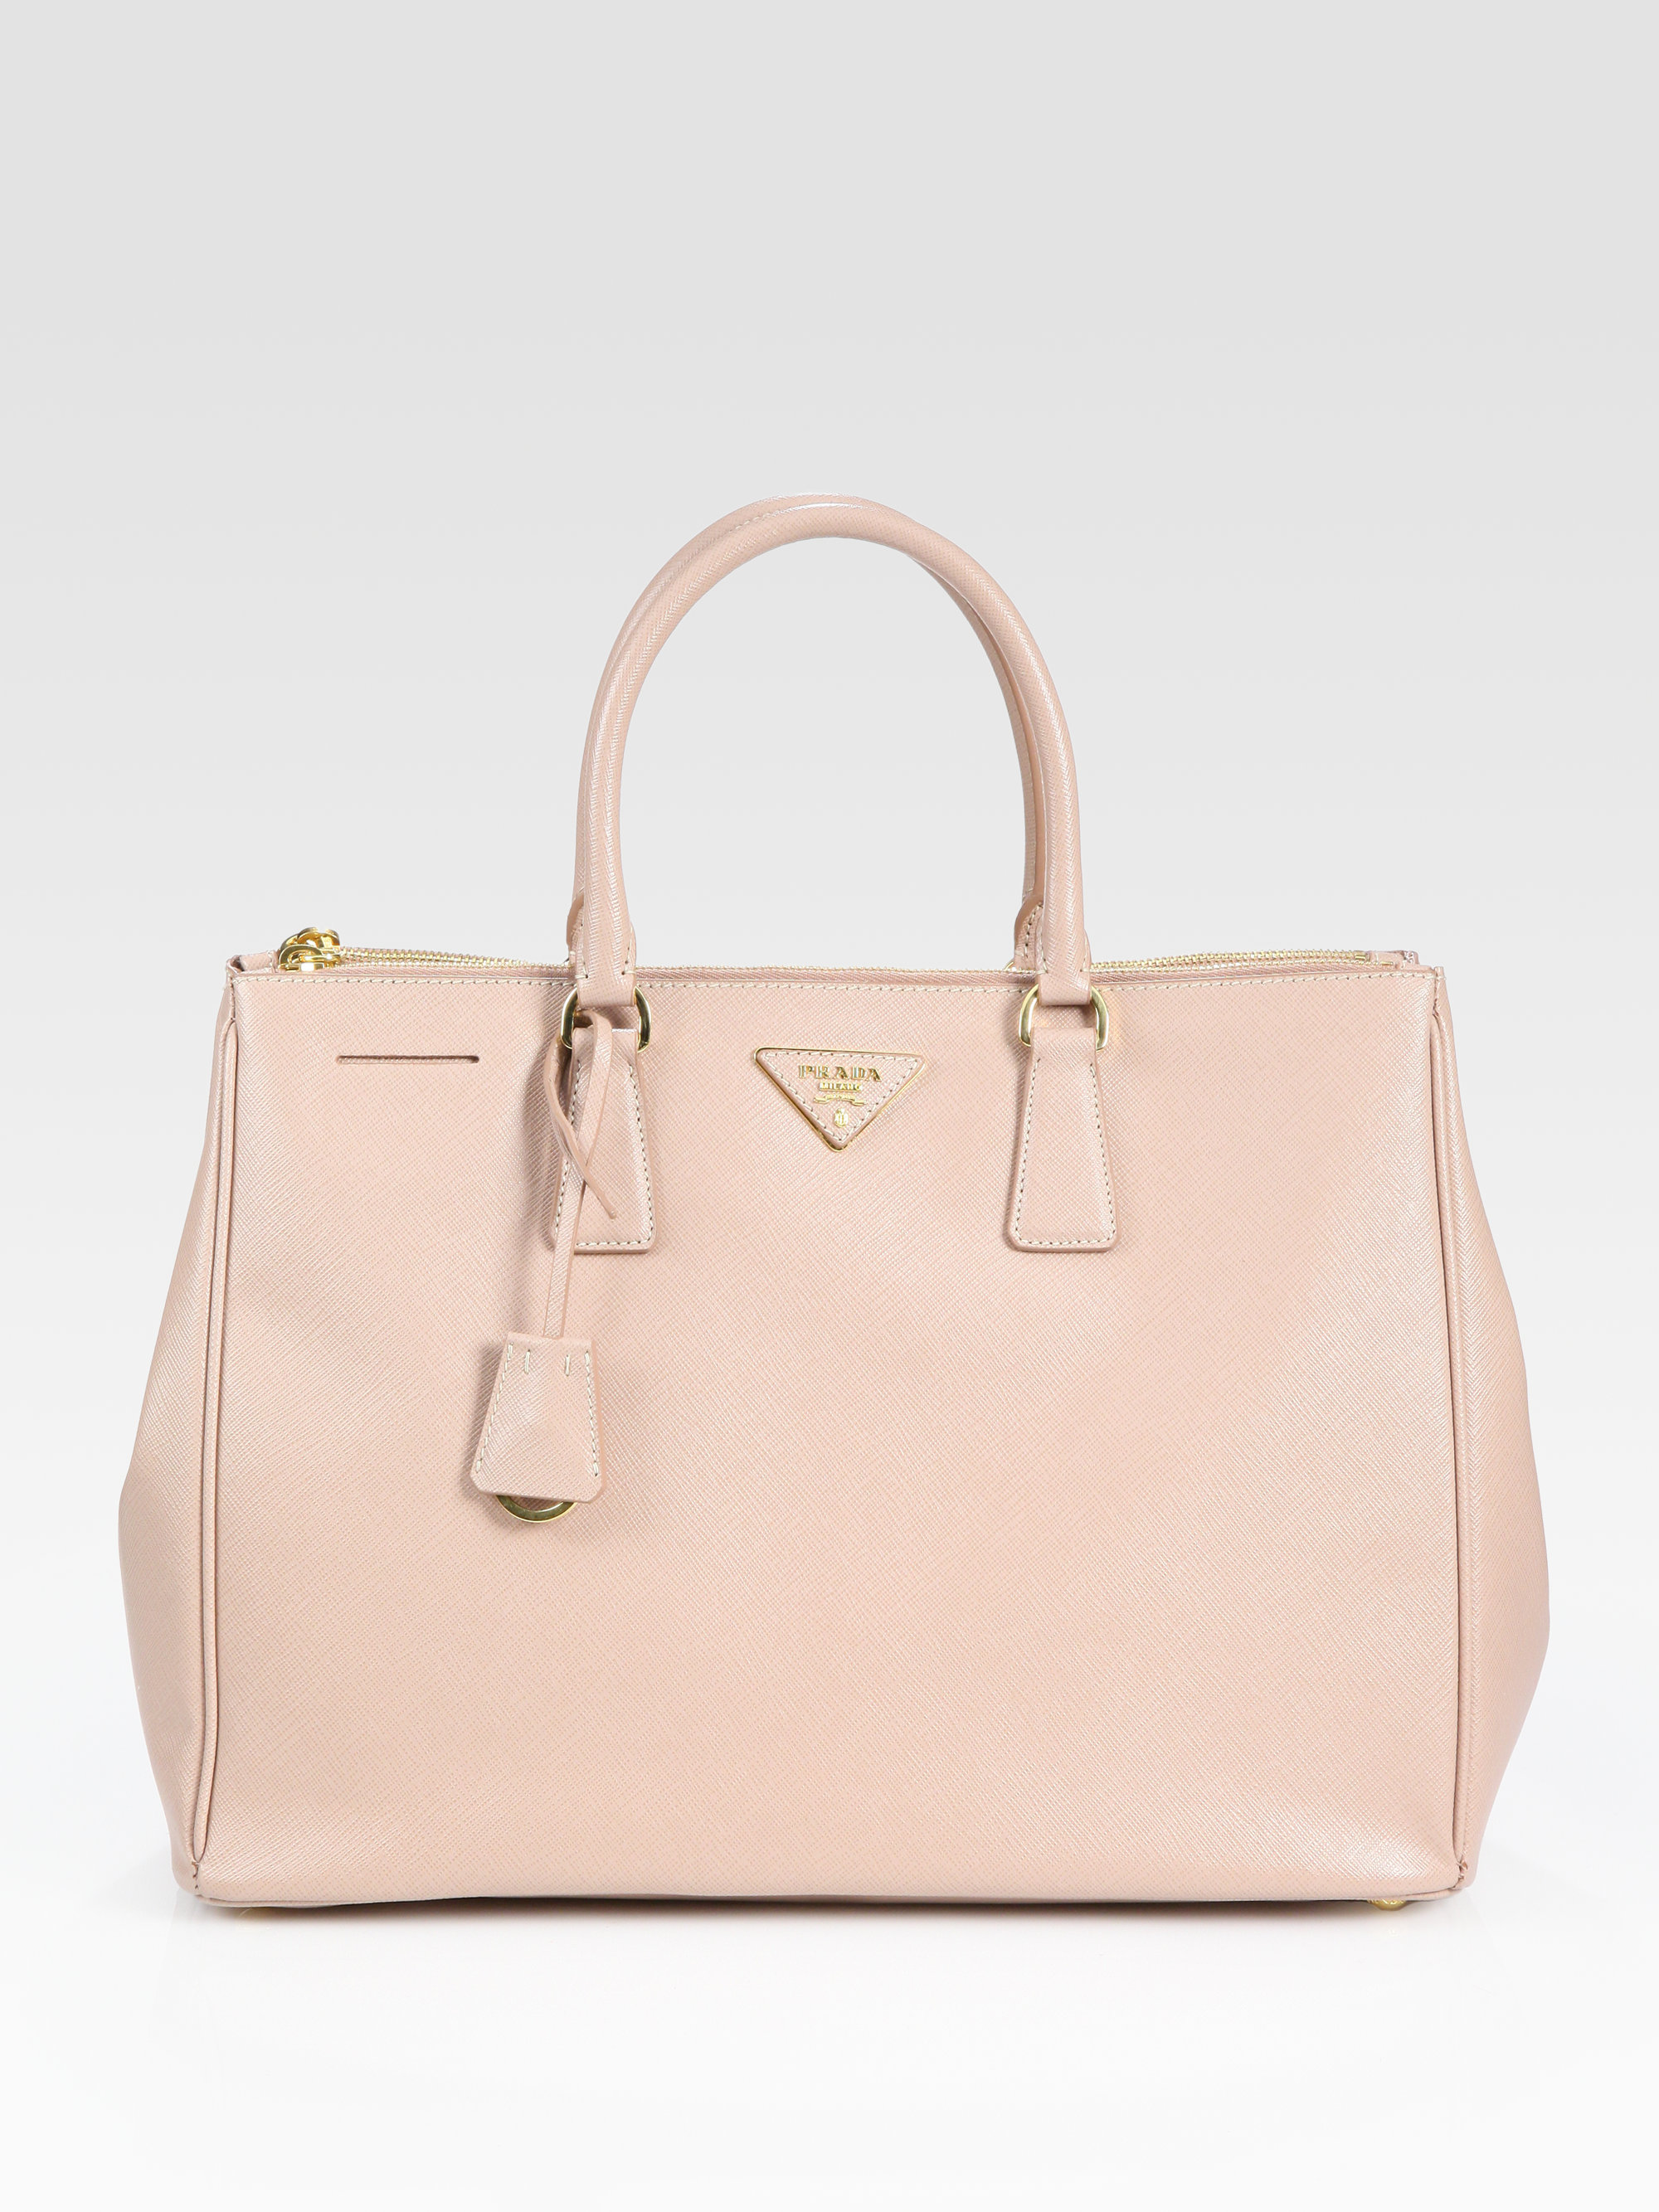 Prada Saffiano Lux Doublezip Tote in Pink | Lyst